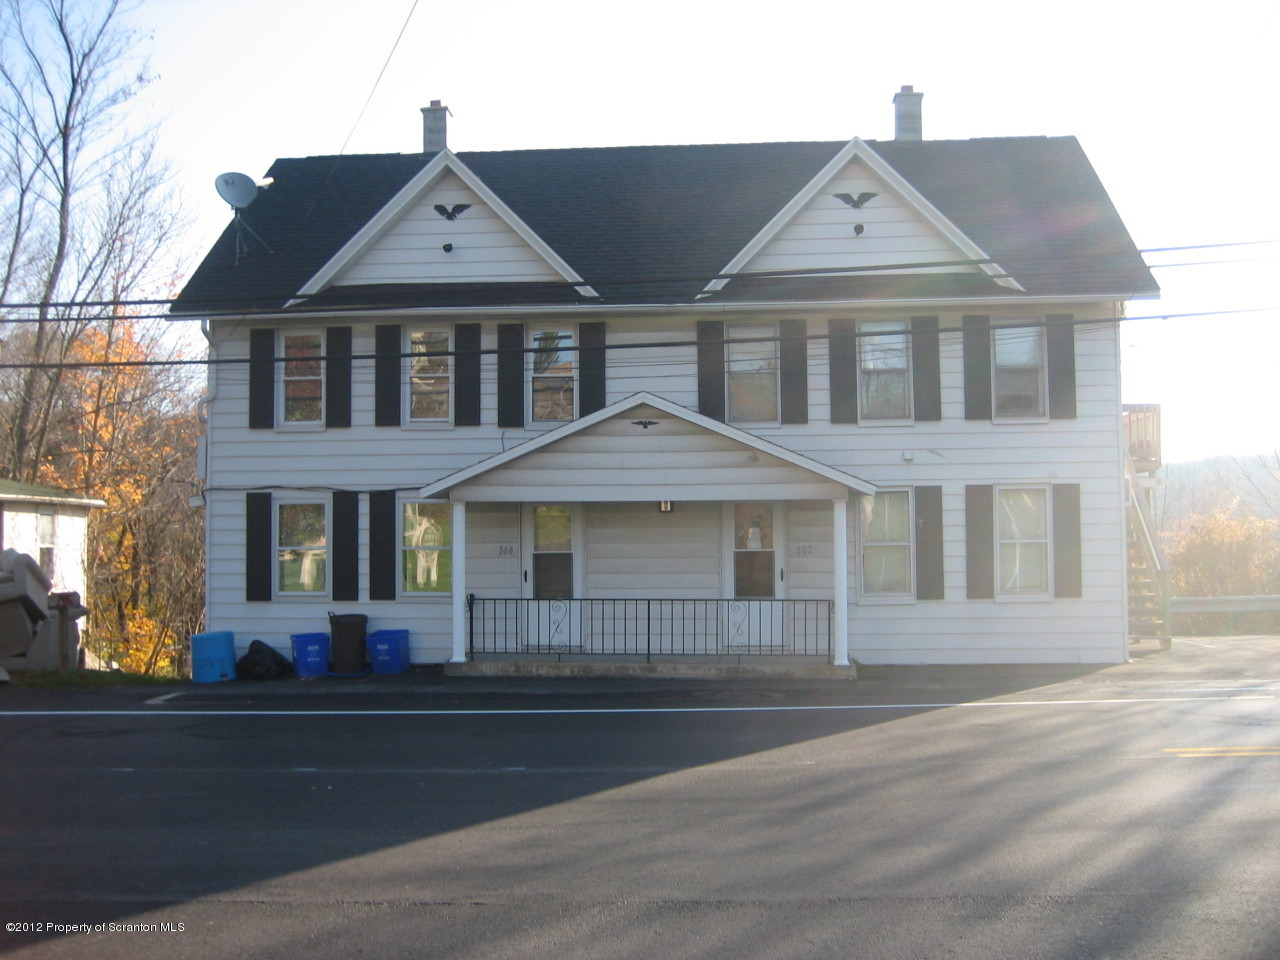 142-144 Main St, Moscow, Pennsylvania 18444, ,3 BathroomsBathrooms,Commercial,For Sale,Main,12-4892